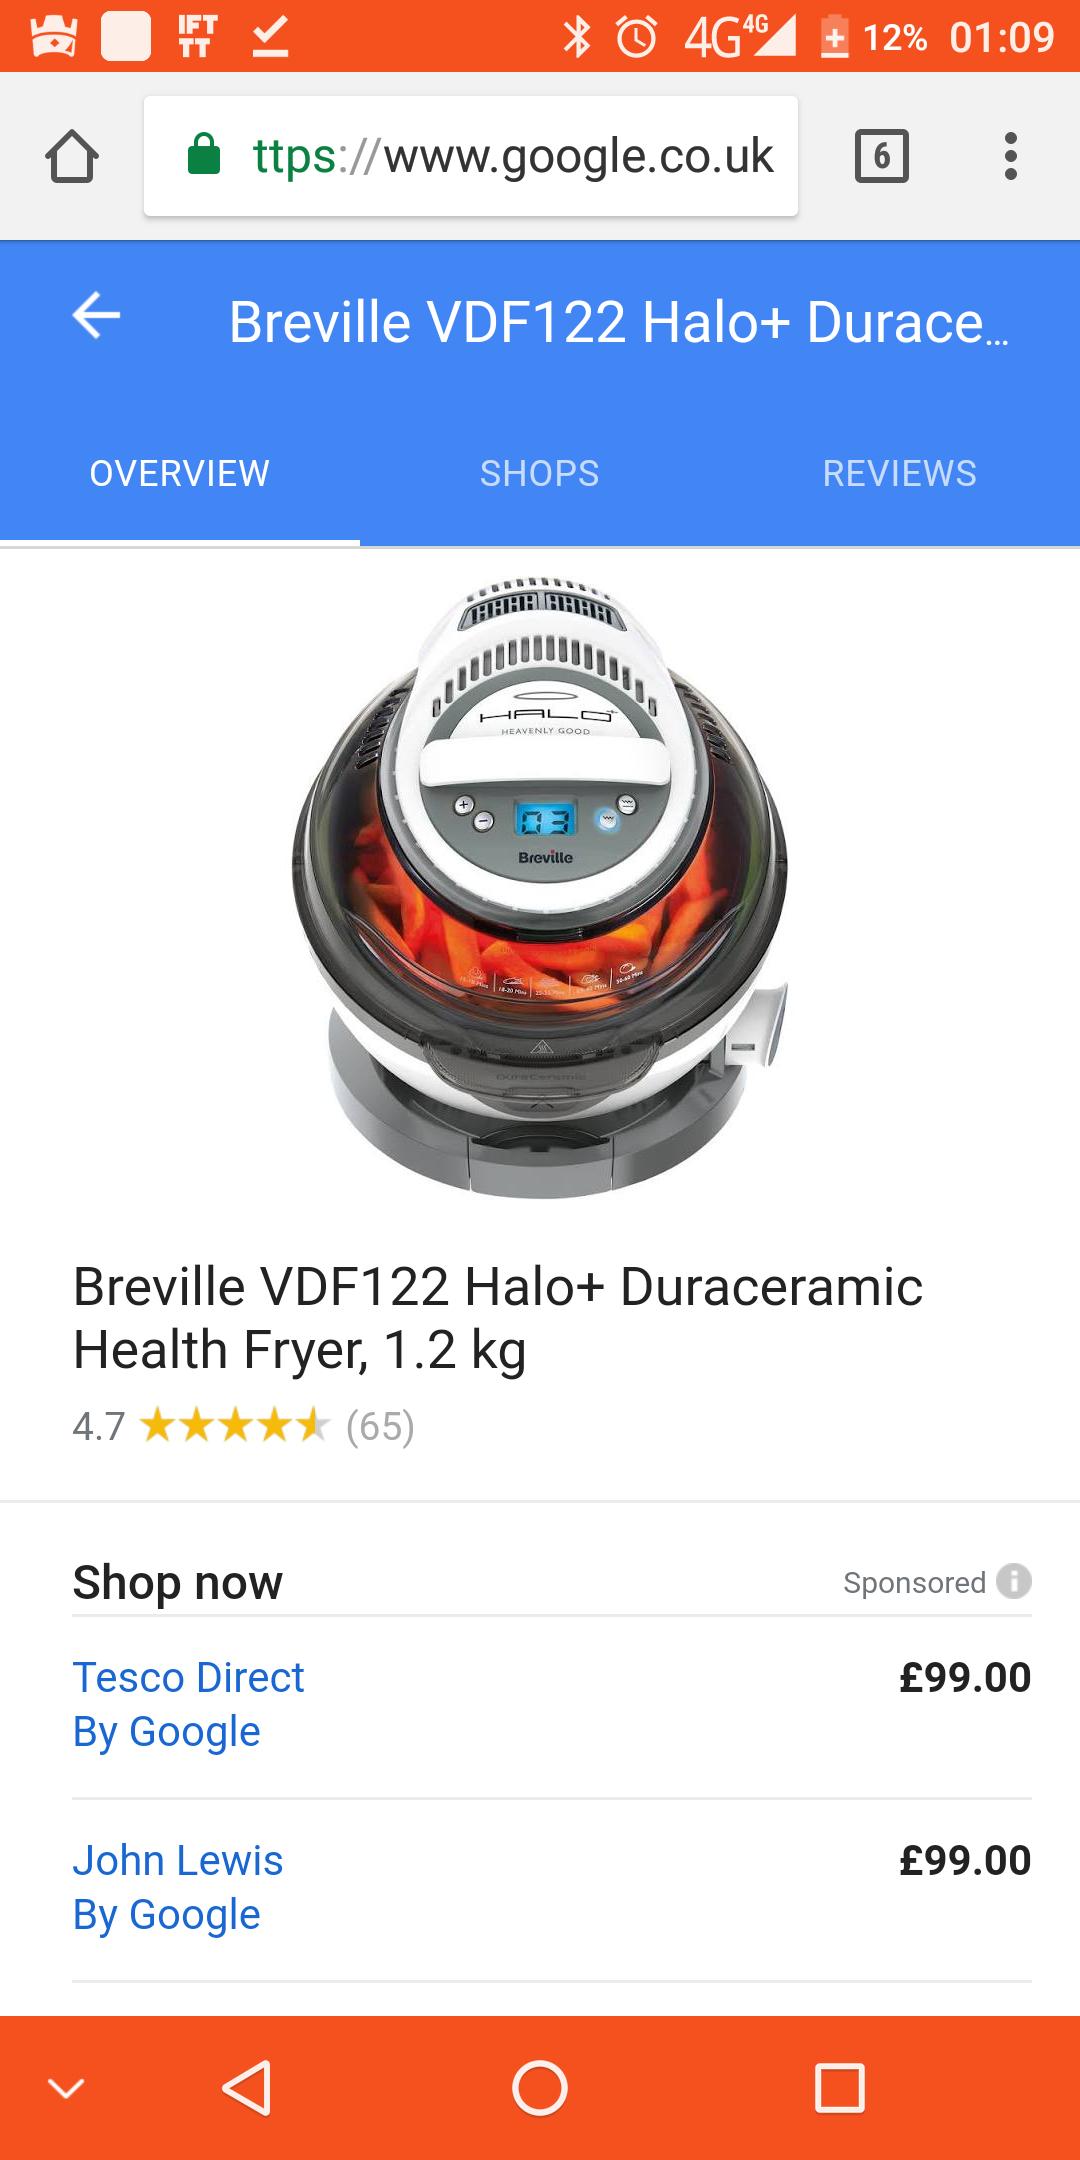 Breville VDF122 Halo+ Duroceramic Health Fryer £69.99 at Amazon